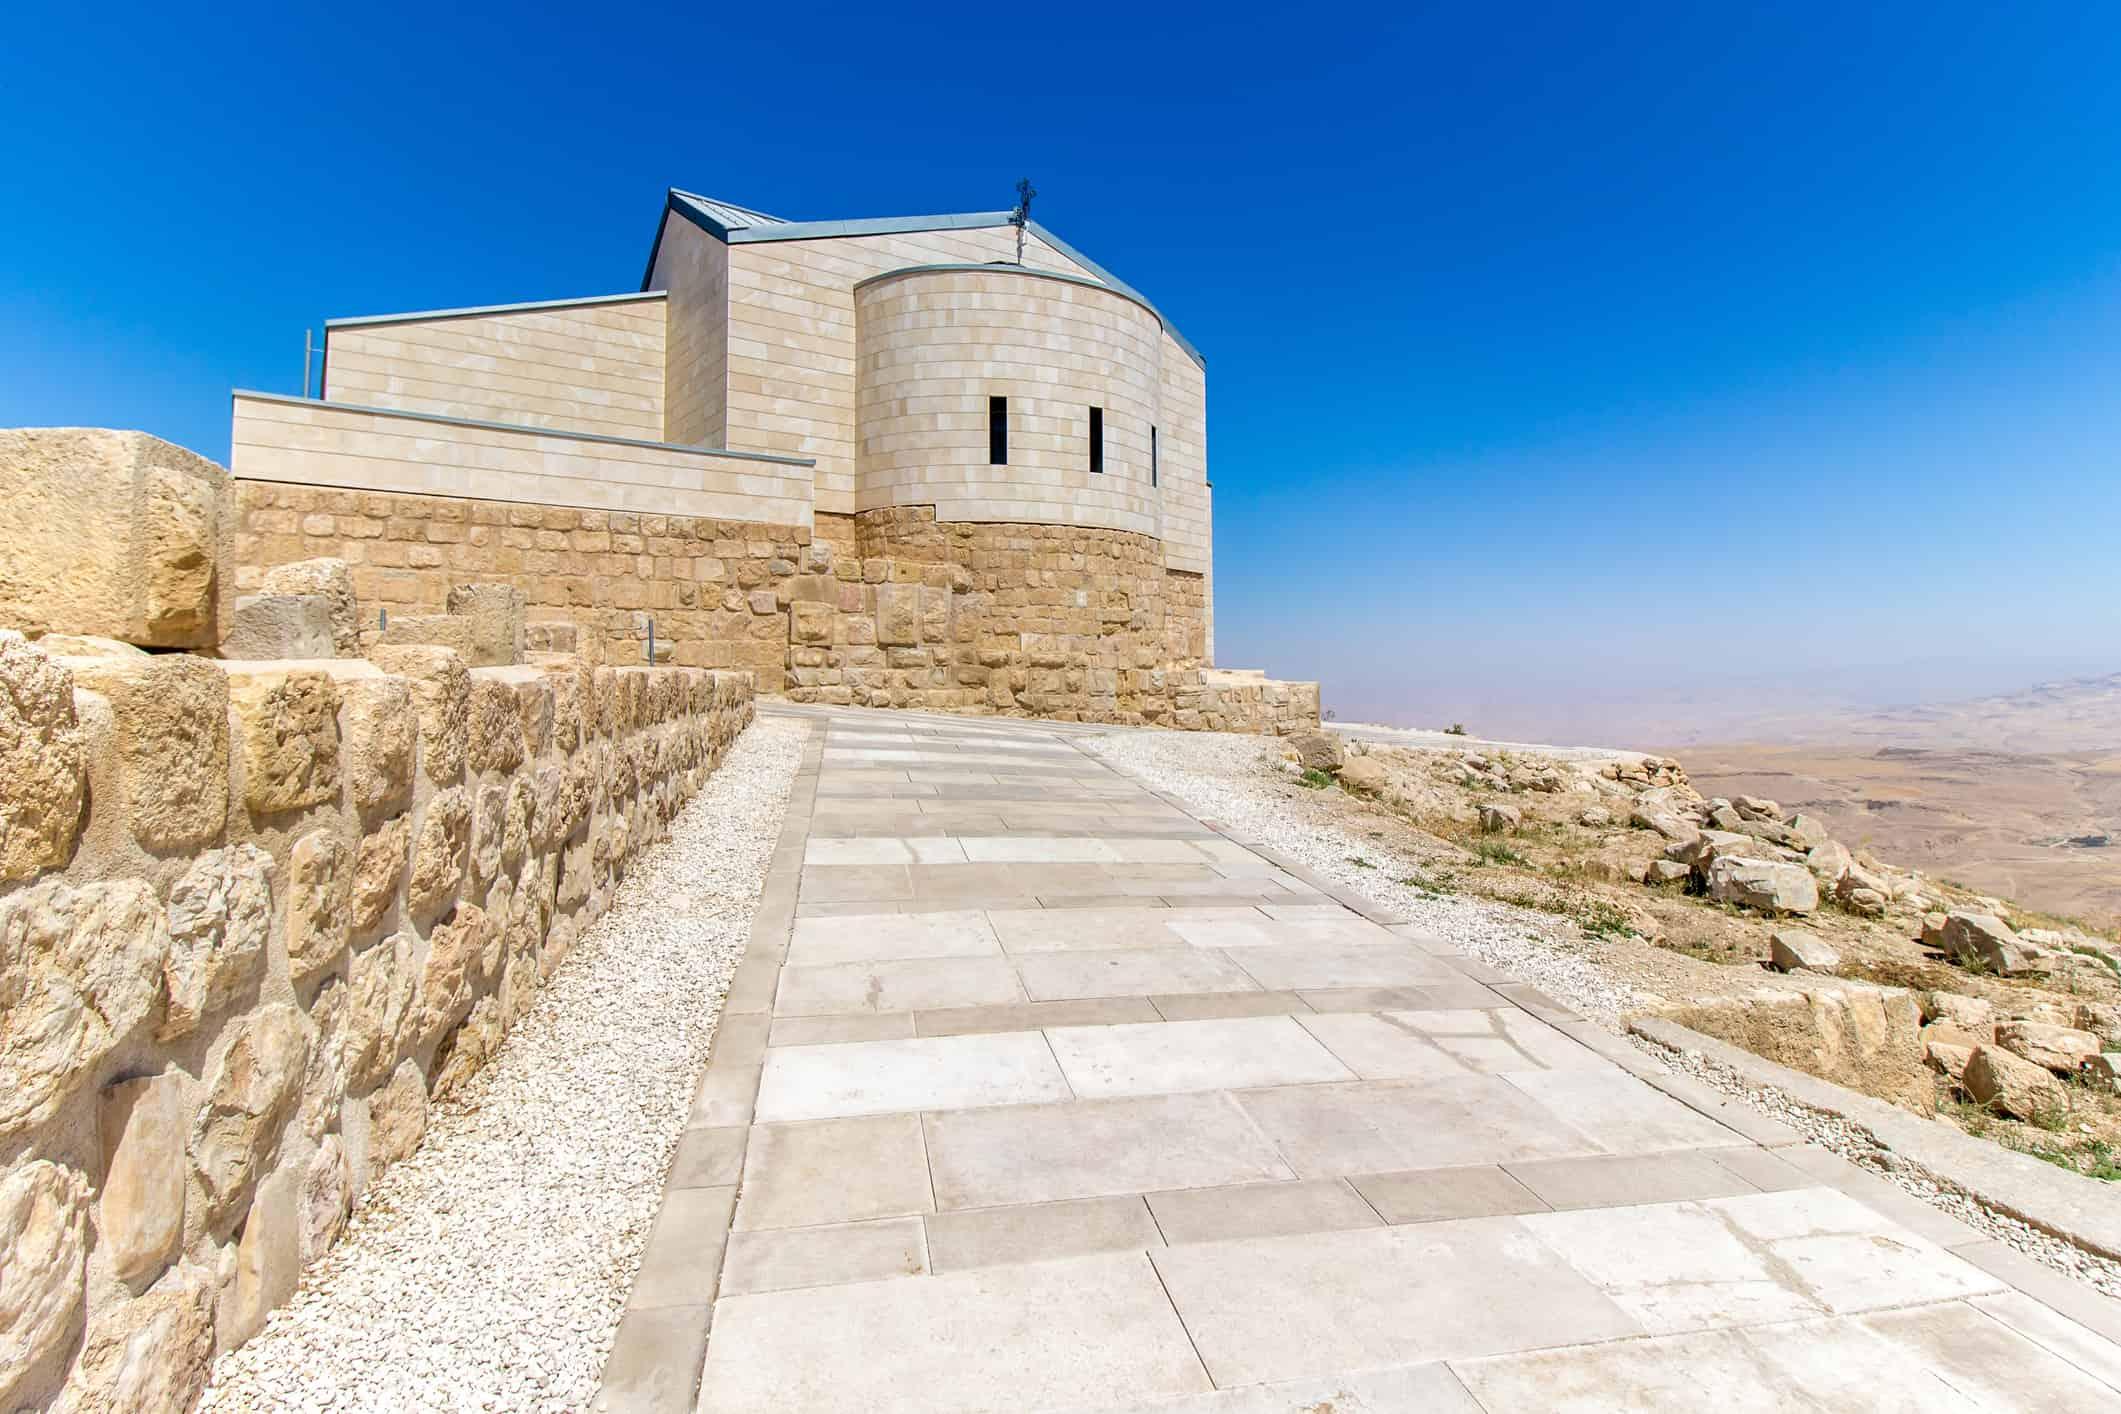 Church of Moses, Mount Nebo, Jordan